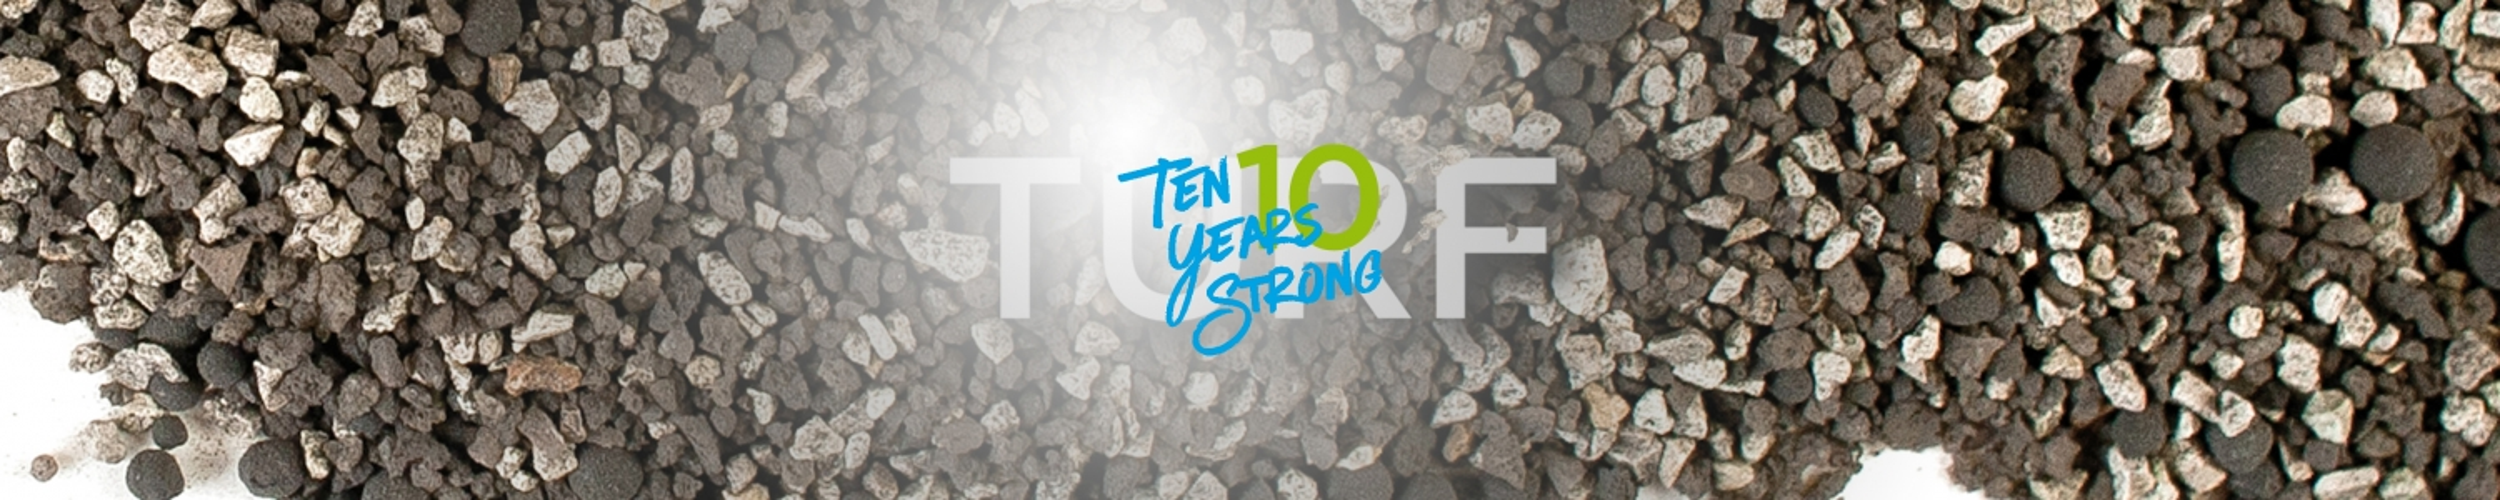 10 jaar TerraCottem Turf